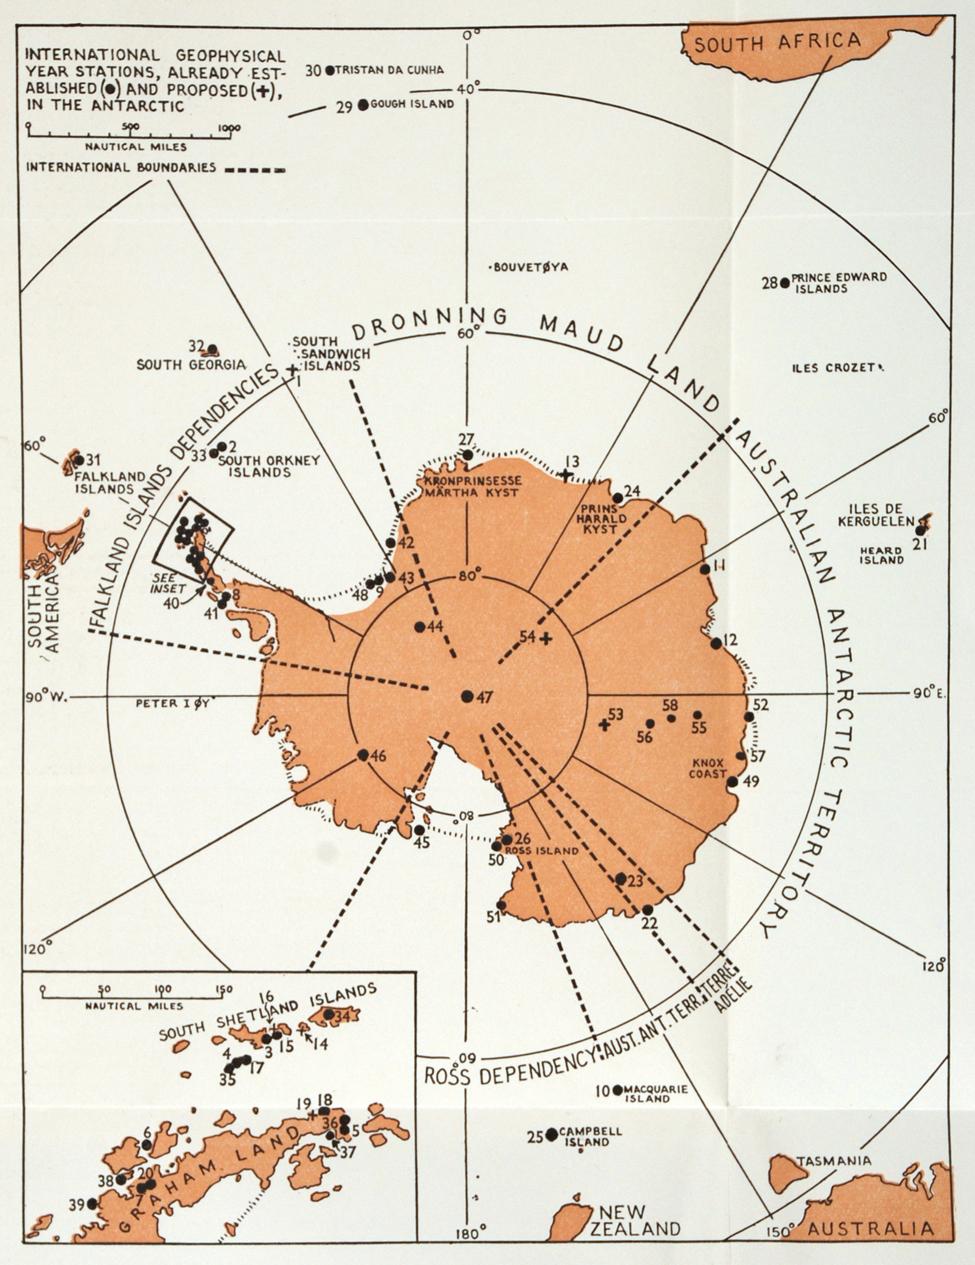 George (Colin) Bertram. <i>Antarctica Today and Tomorrow</i>. Dunedin: University of Otago, 1957.